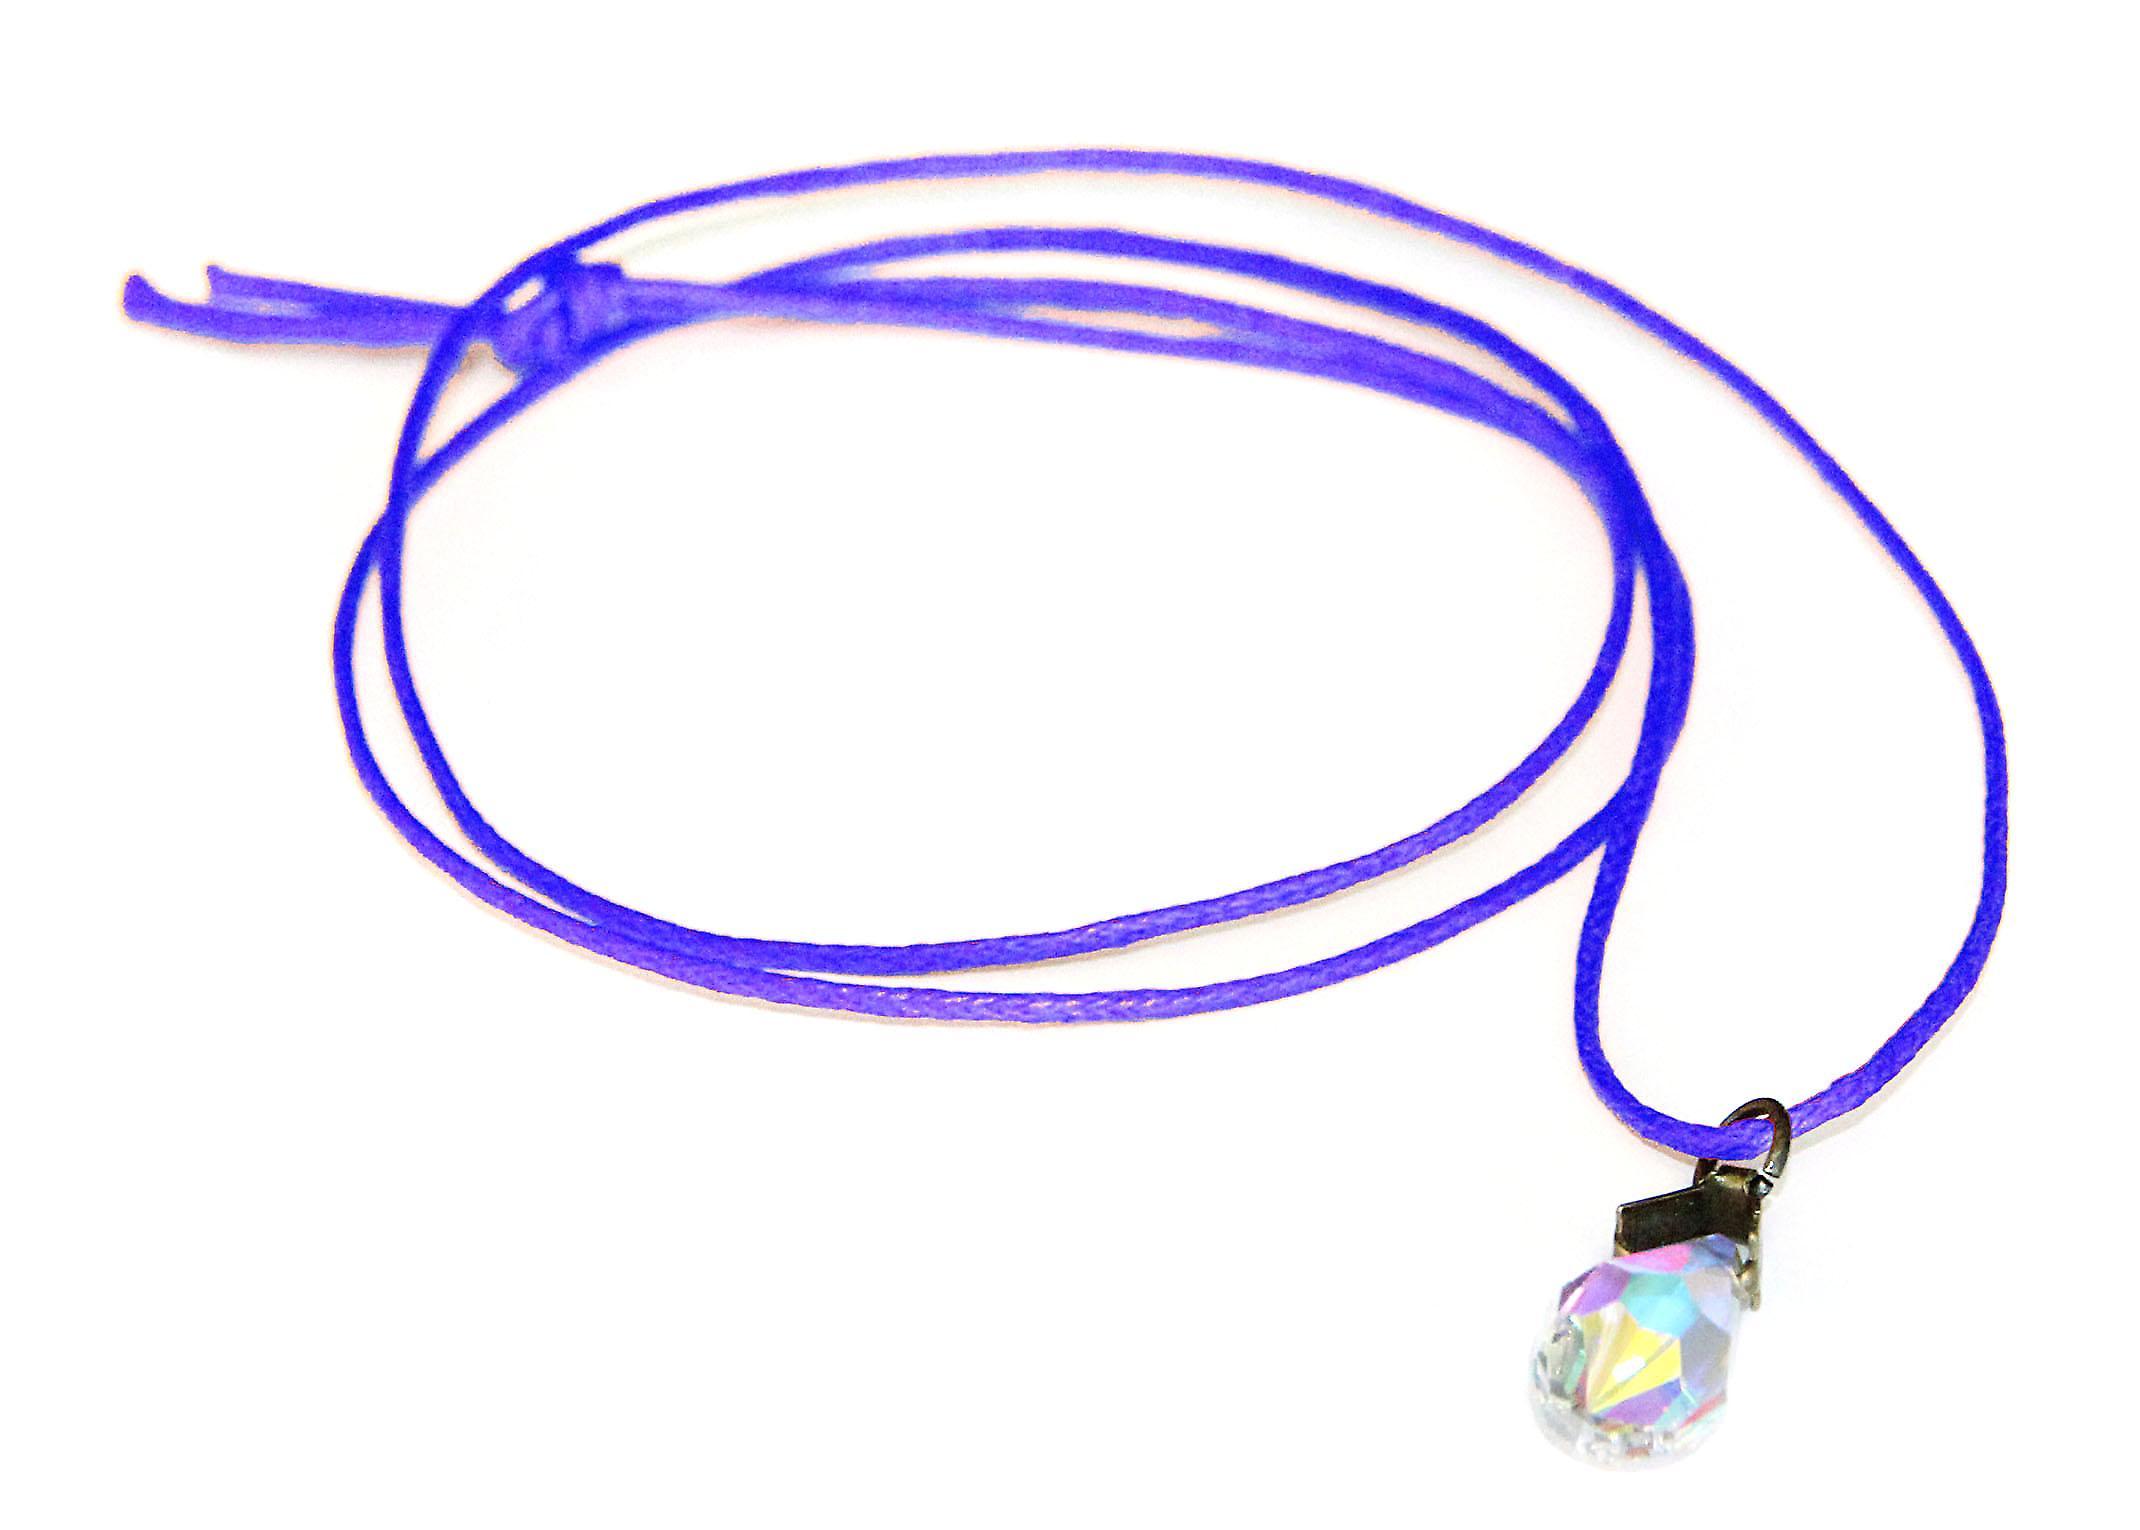 Waooh - Bijoux - Swarovski / Pendentif goutte nacré reflet bleu et cordon ciré